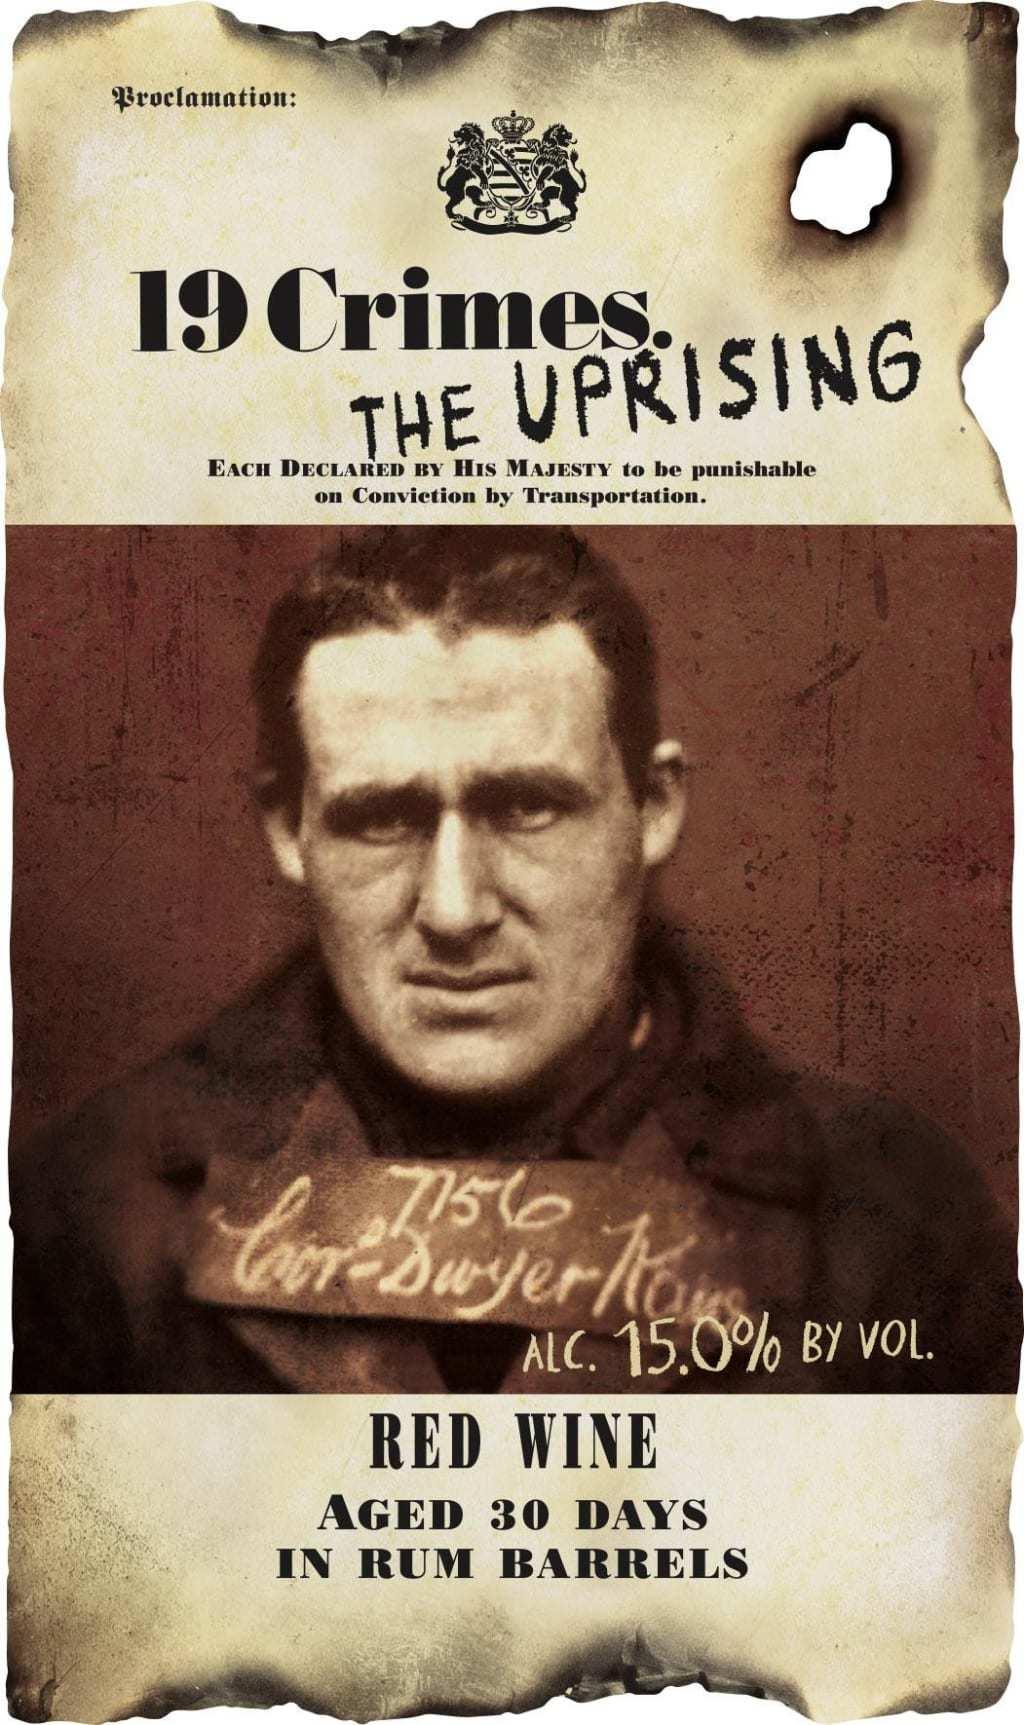 19 Crimes Uprising Red